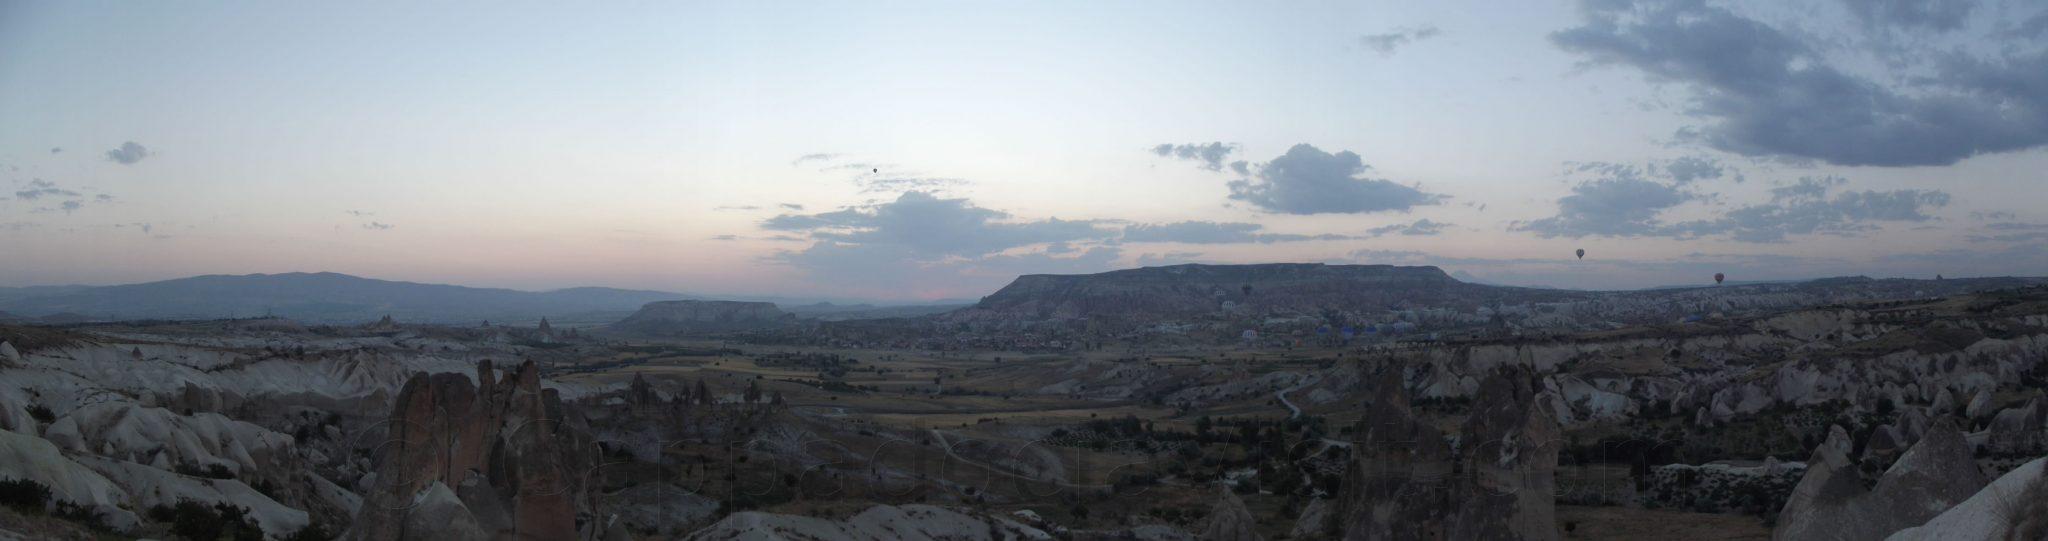 Каппадокия Панорама 3